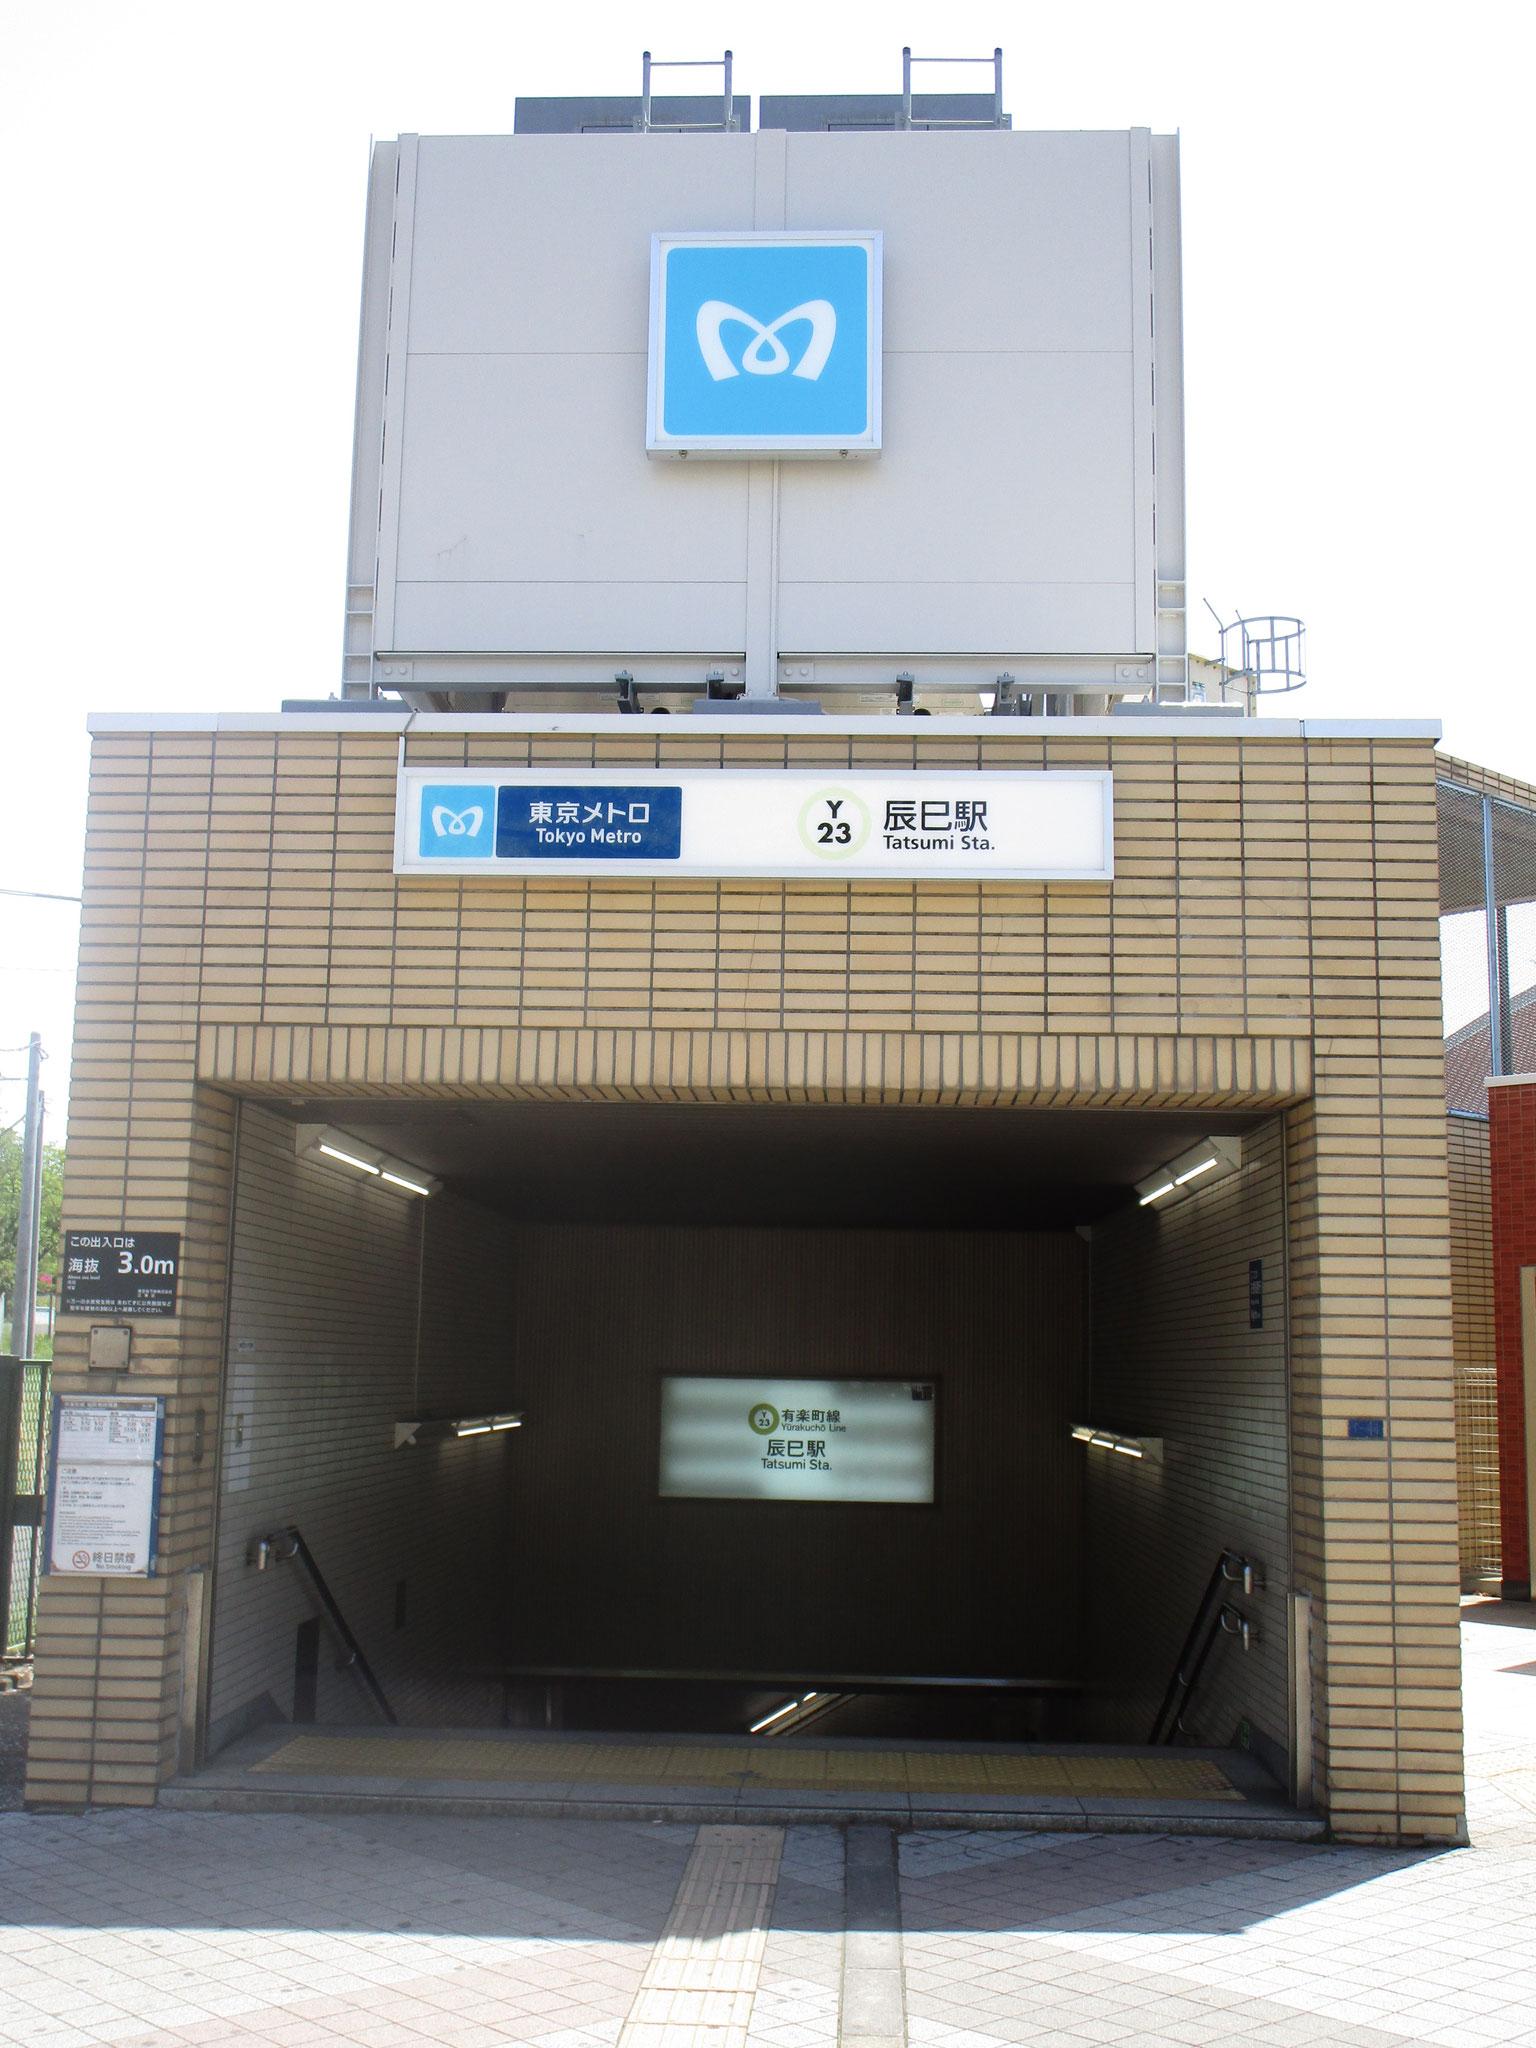 最寄駅は東京メトロ有楽町線「辰巳」駅